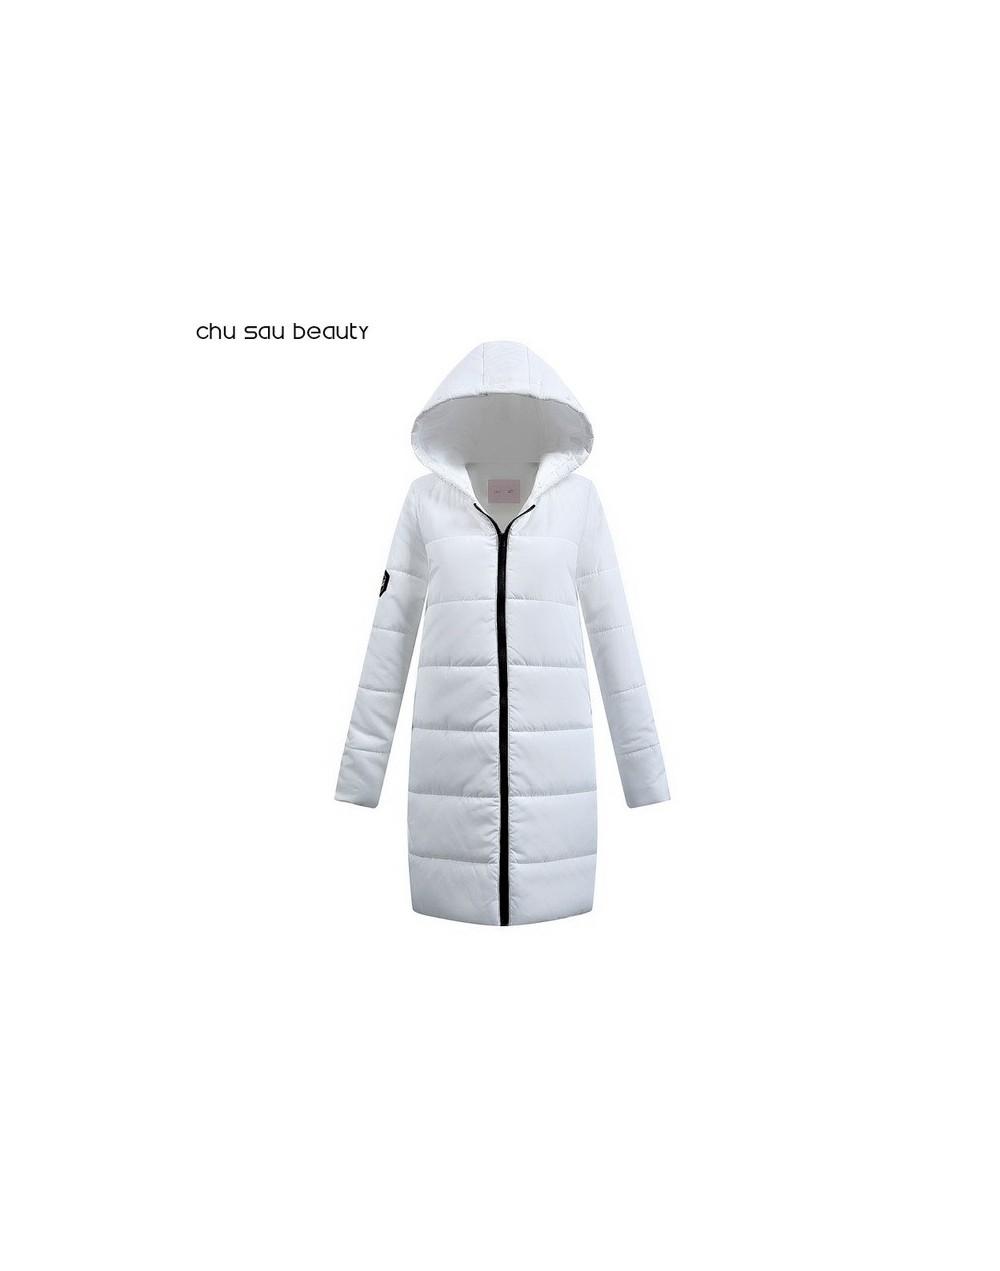 2018 Spring thin New Autumn long jacket Women Coat Fashion Female Down jacket Women Parkas Casual Jackets Inverno Parka - CY...